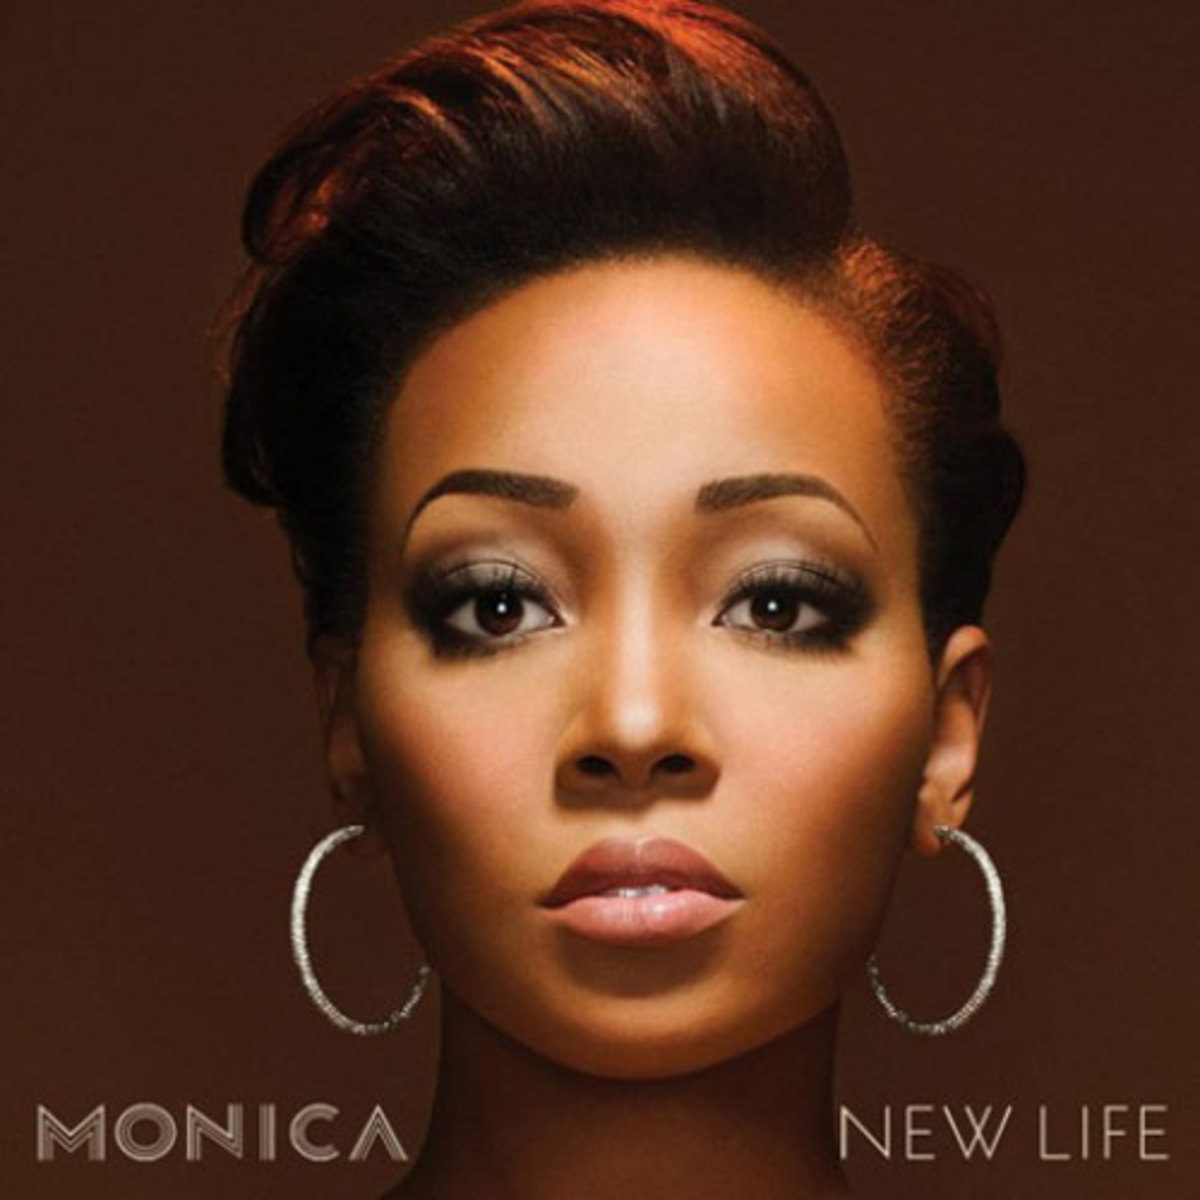 monica-newlife.jpg